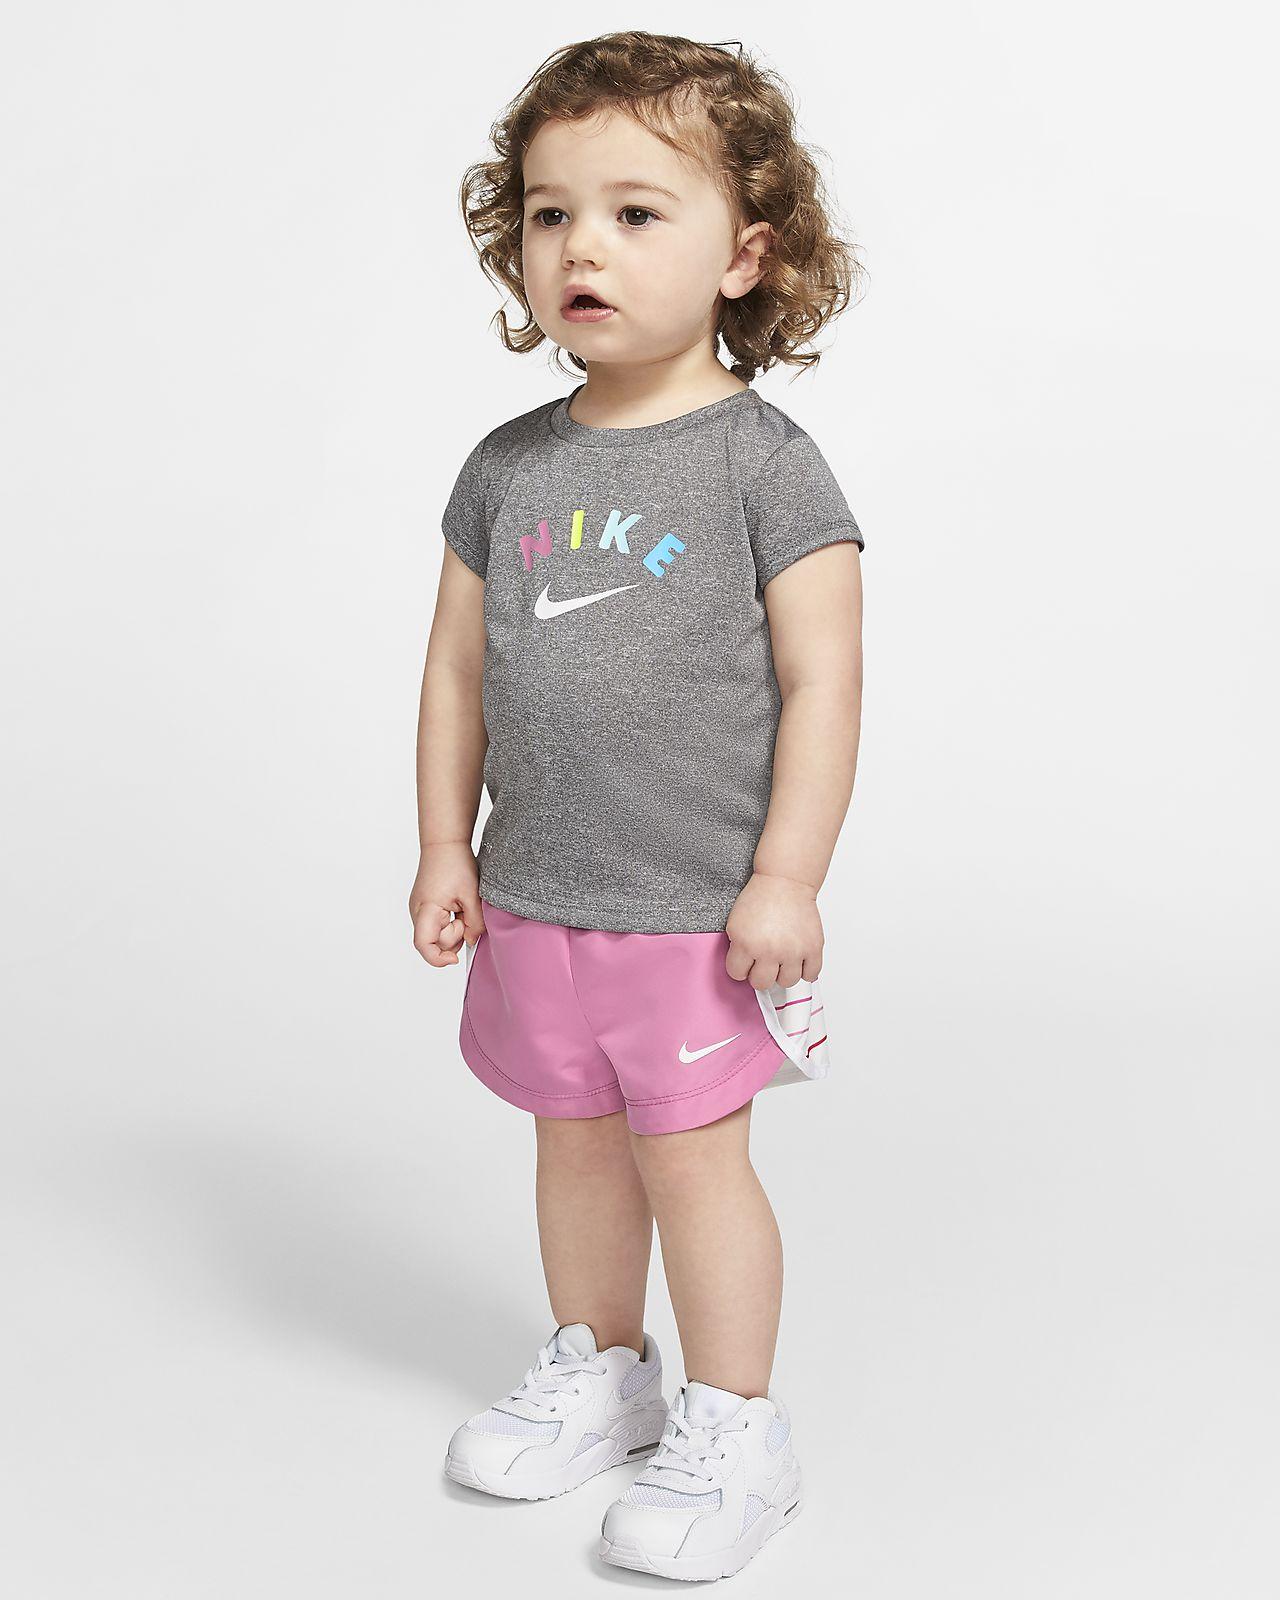 Nike Dri-FIT Baby (12–24M) T-Shirt and Shorts Set